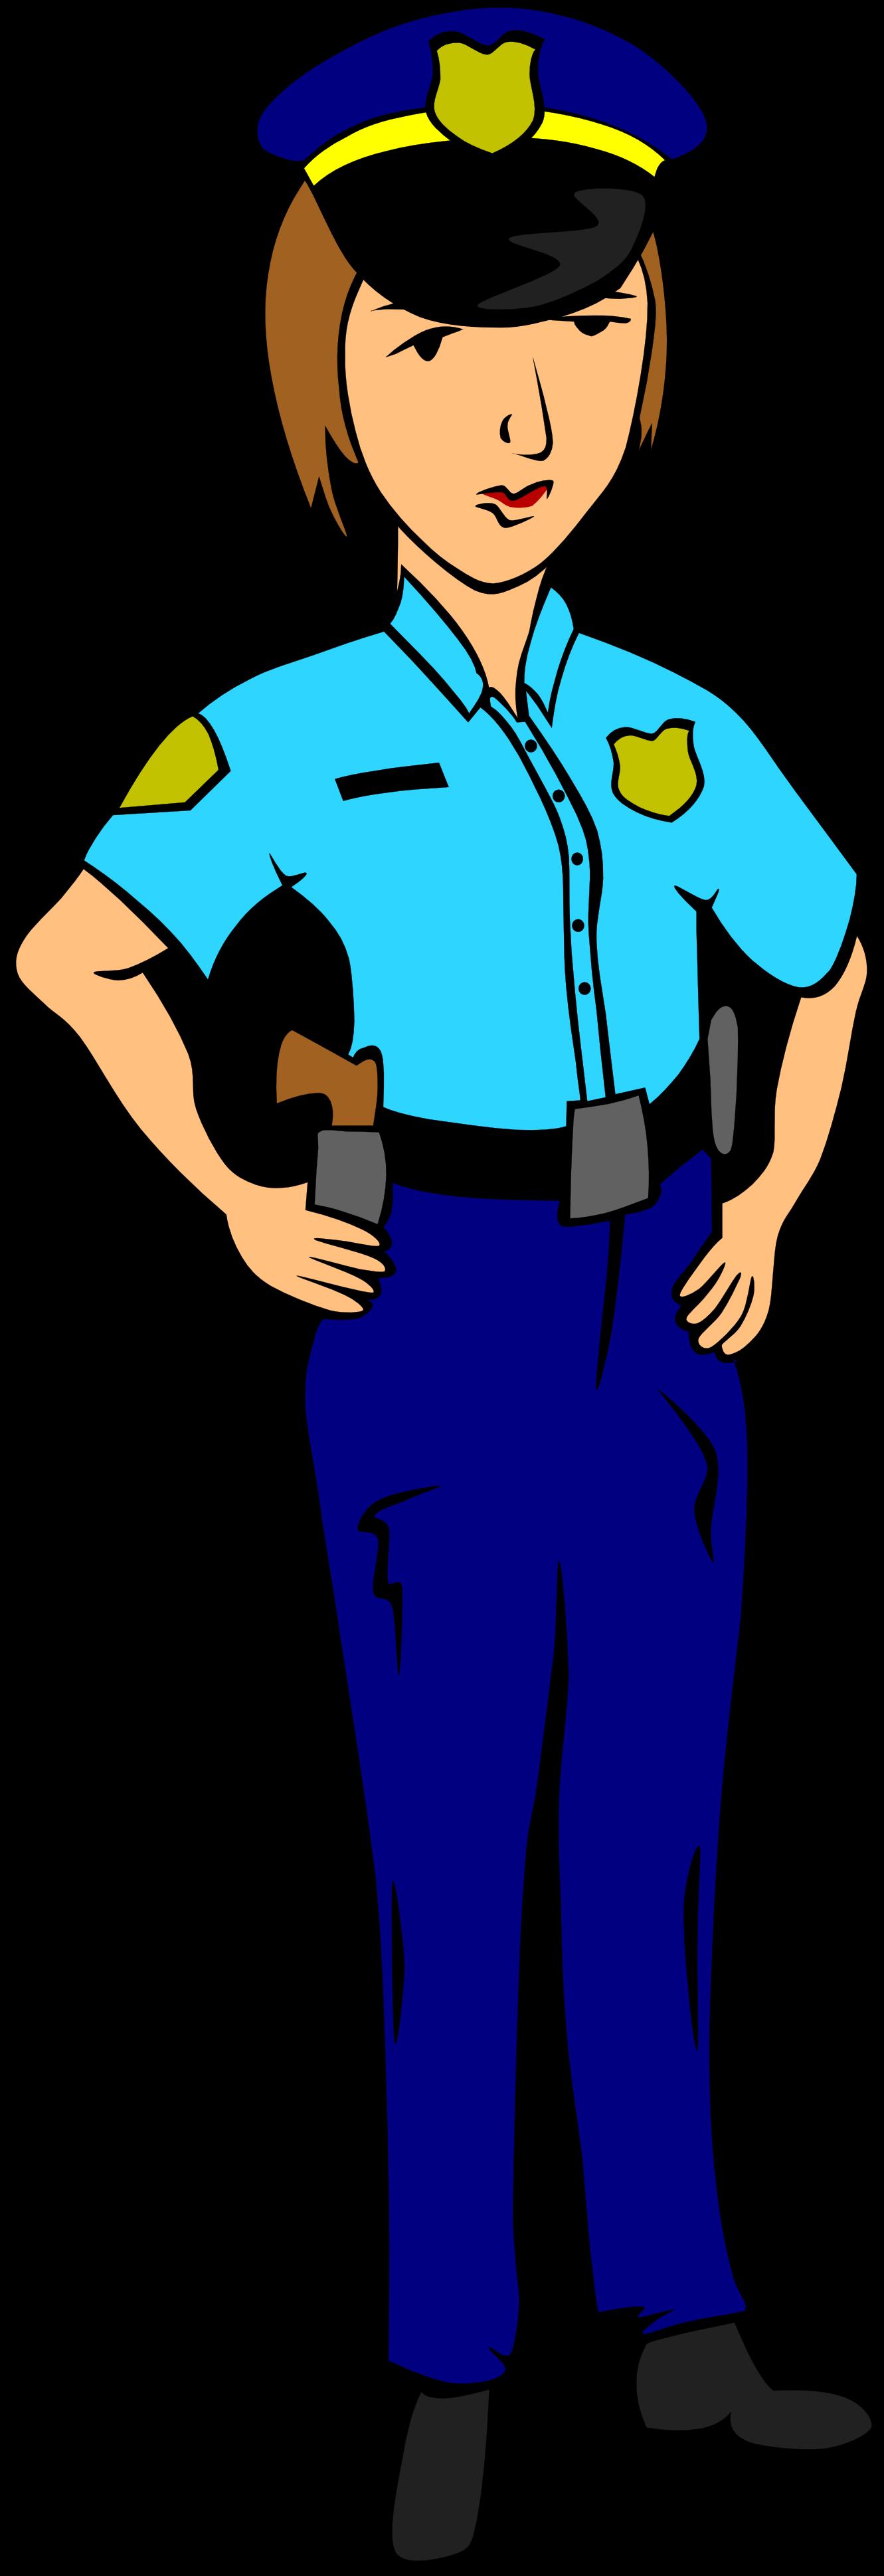 Criminal clipart police. Clip art gerald g